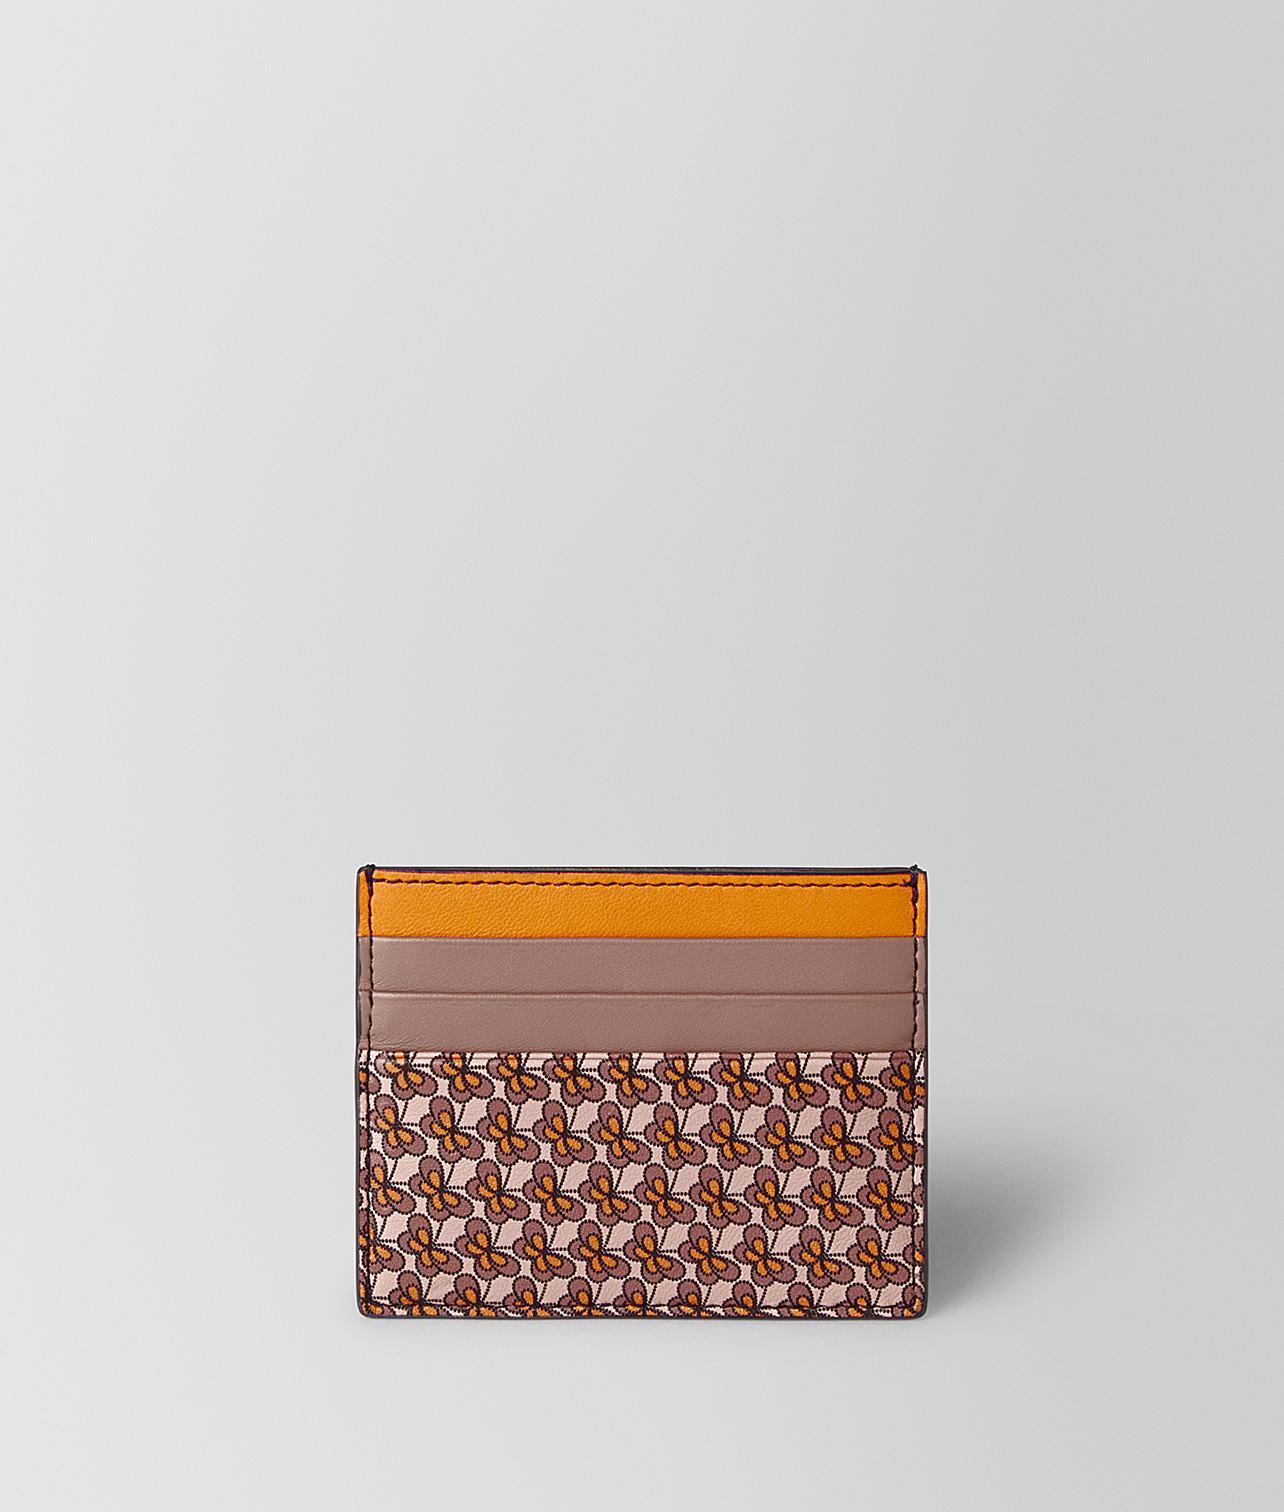 05bcccb37835 Lyst - Bottega Veneta Card Case